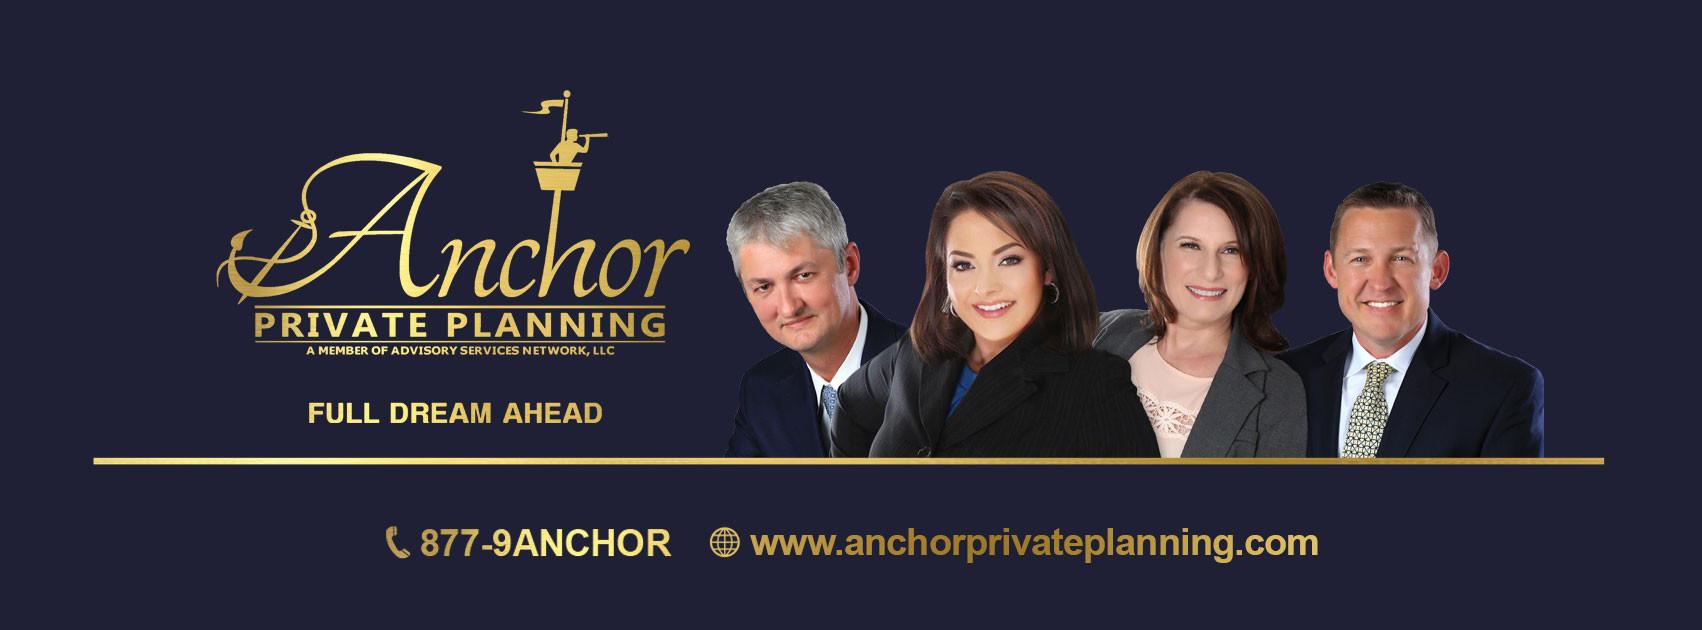 Anchor-Private-Planning-2020logo.jpg